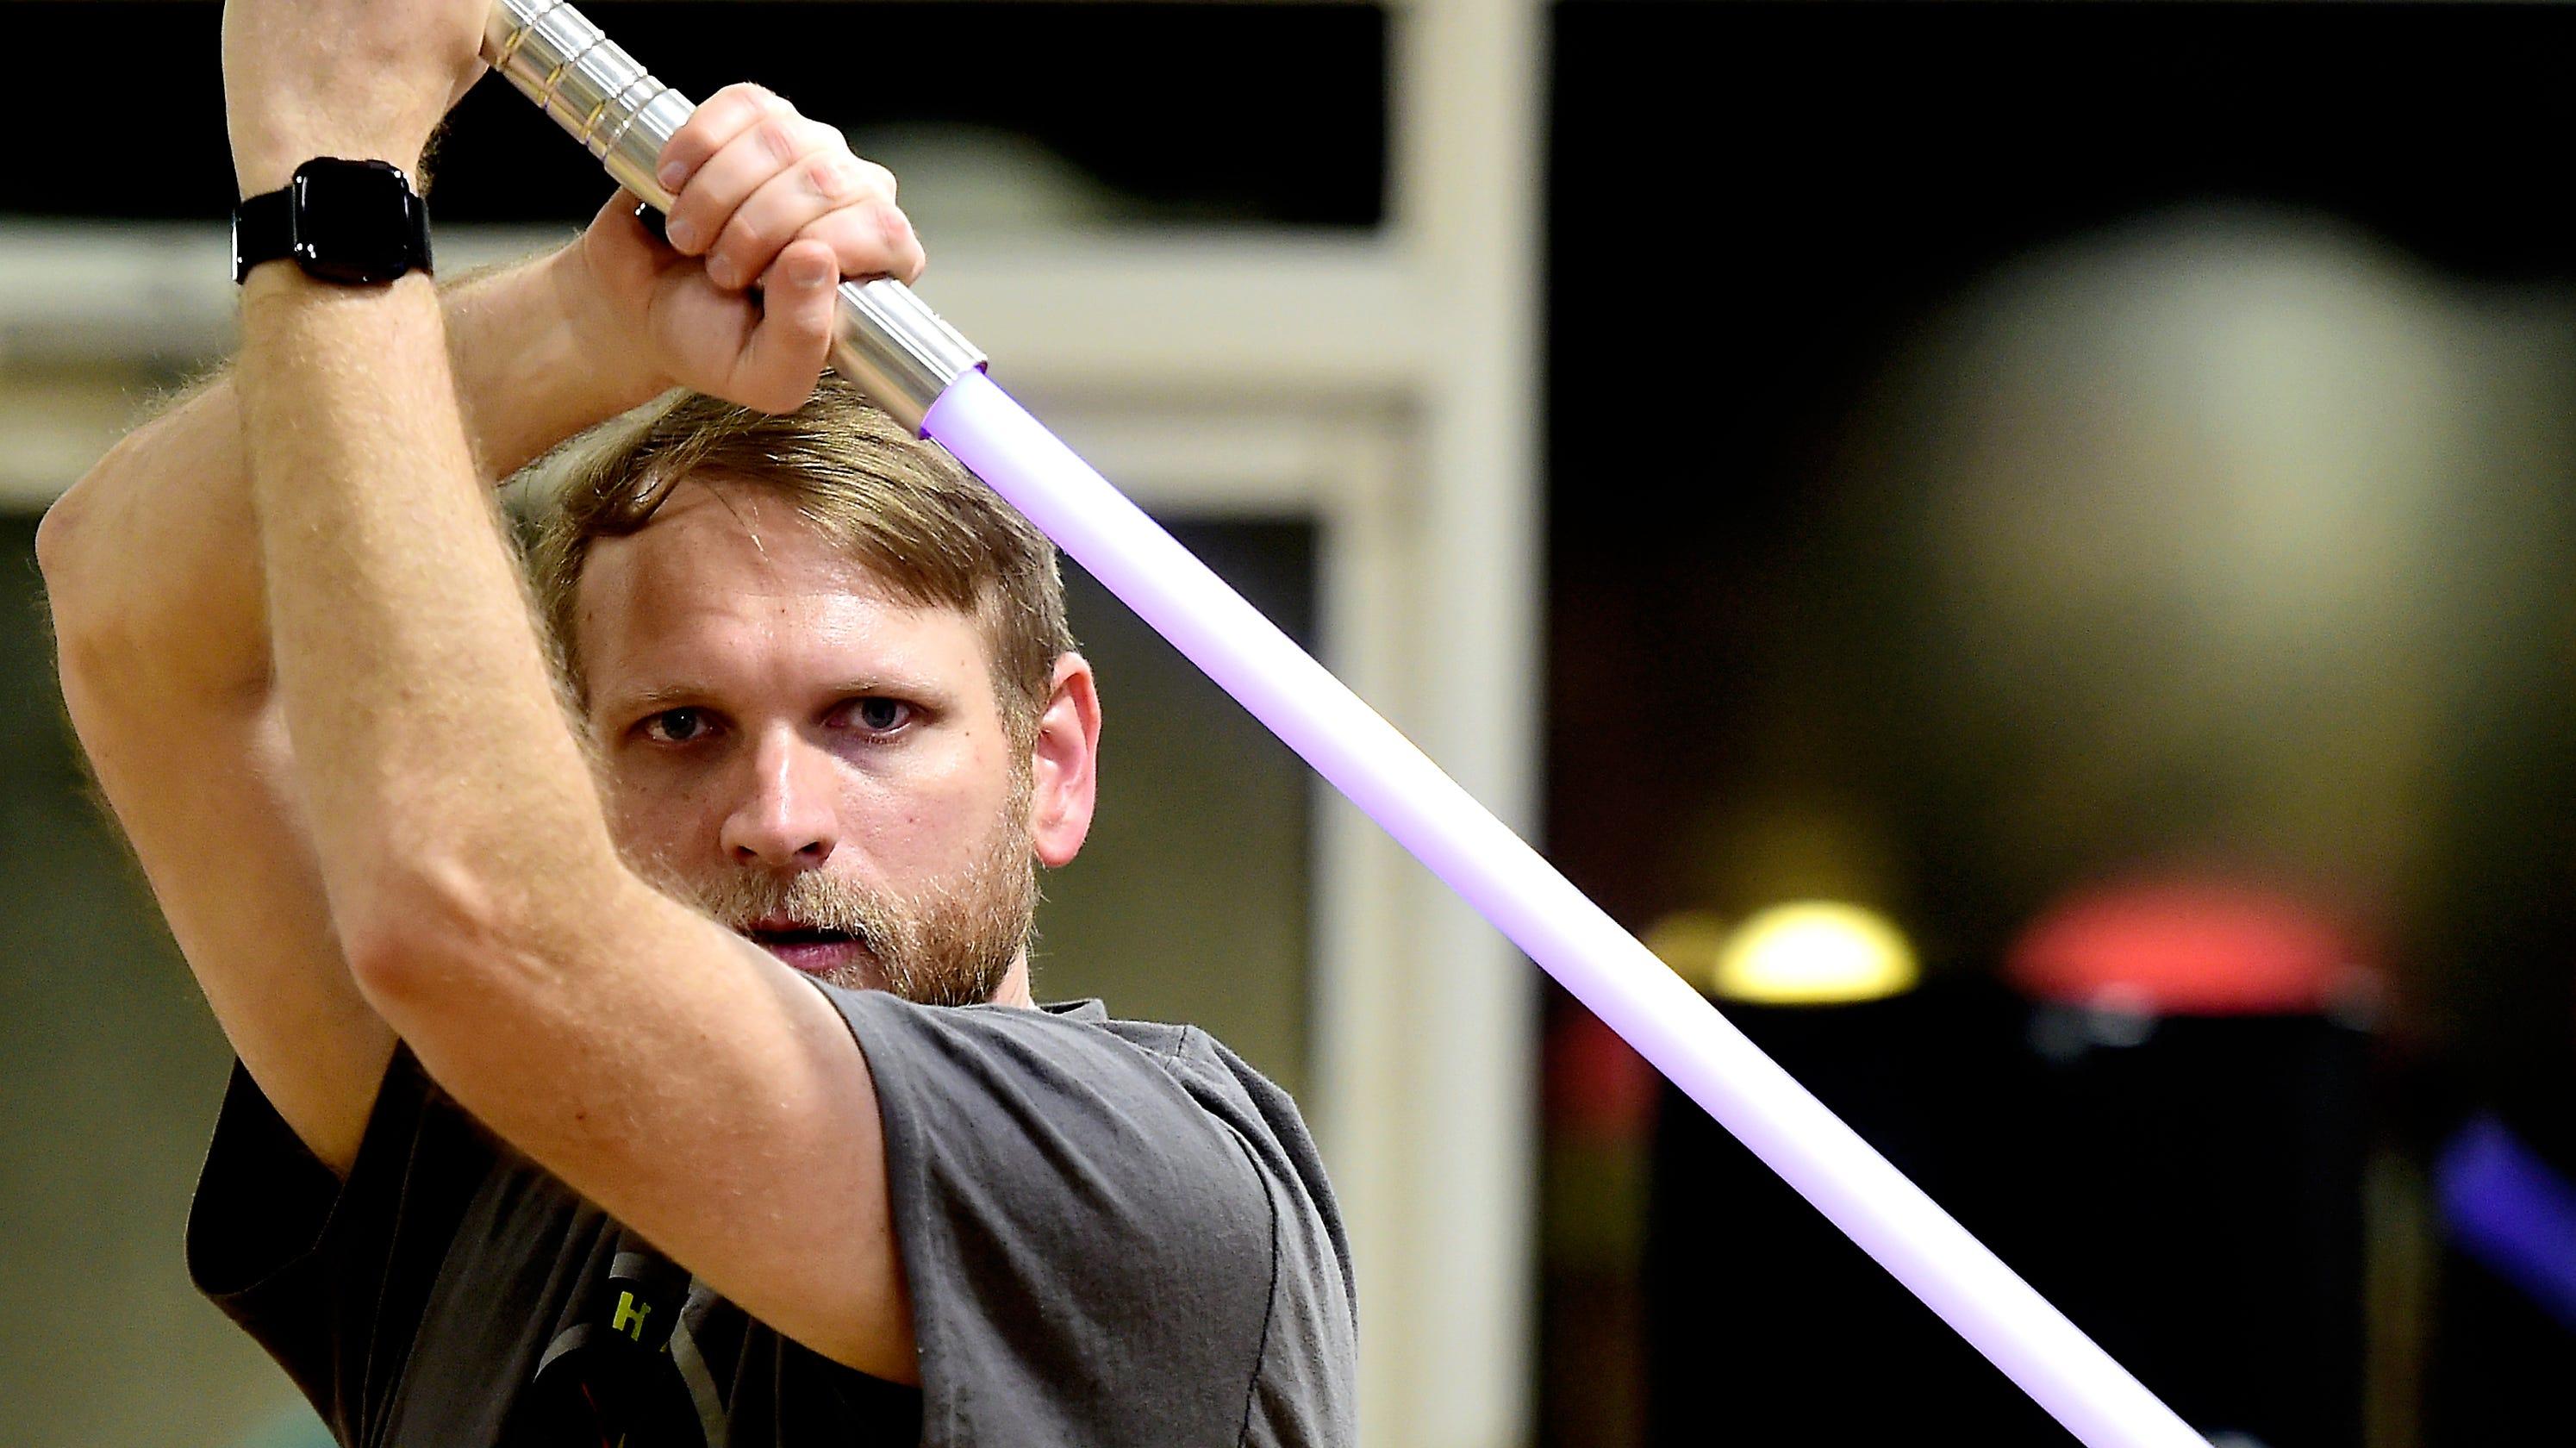 Light or dark side? Ithaca Sabers teaches 'Star Wars